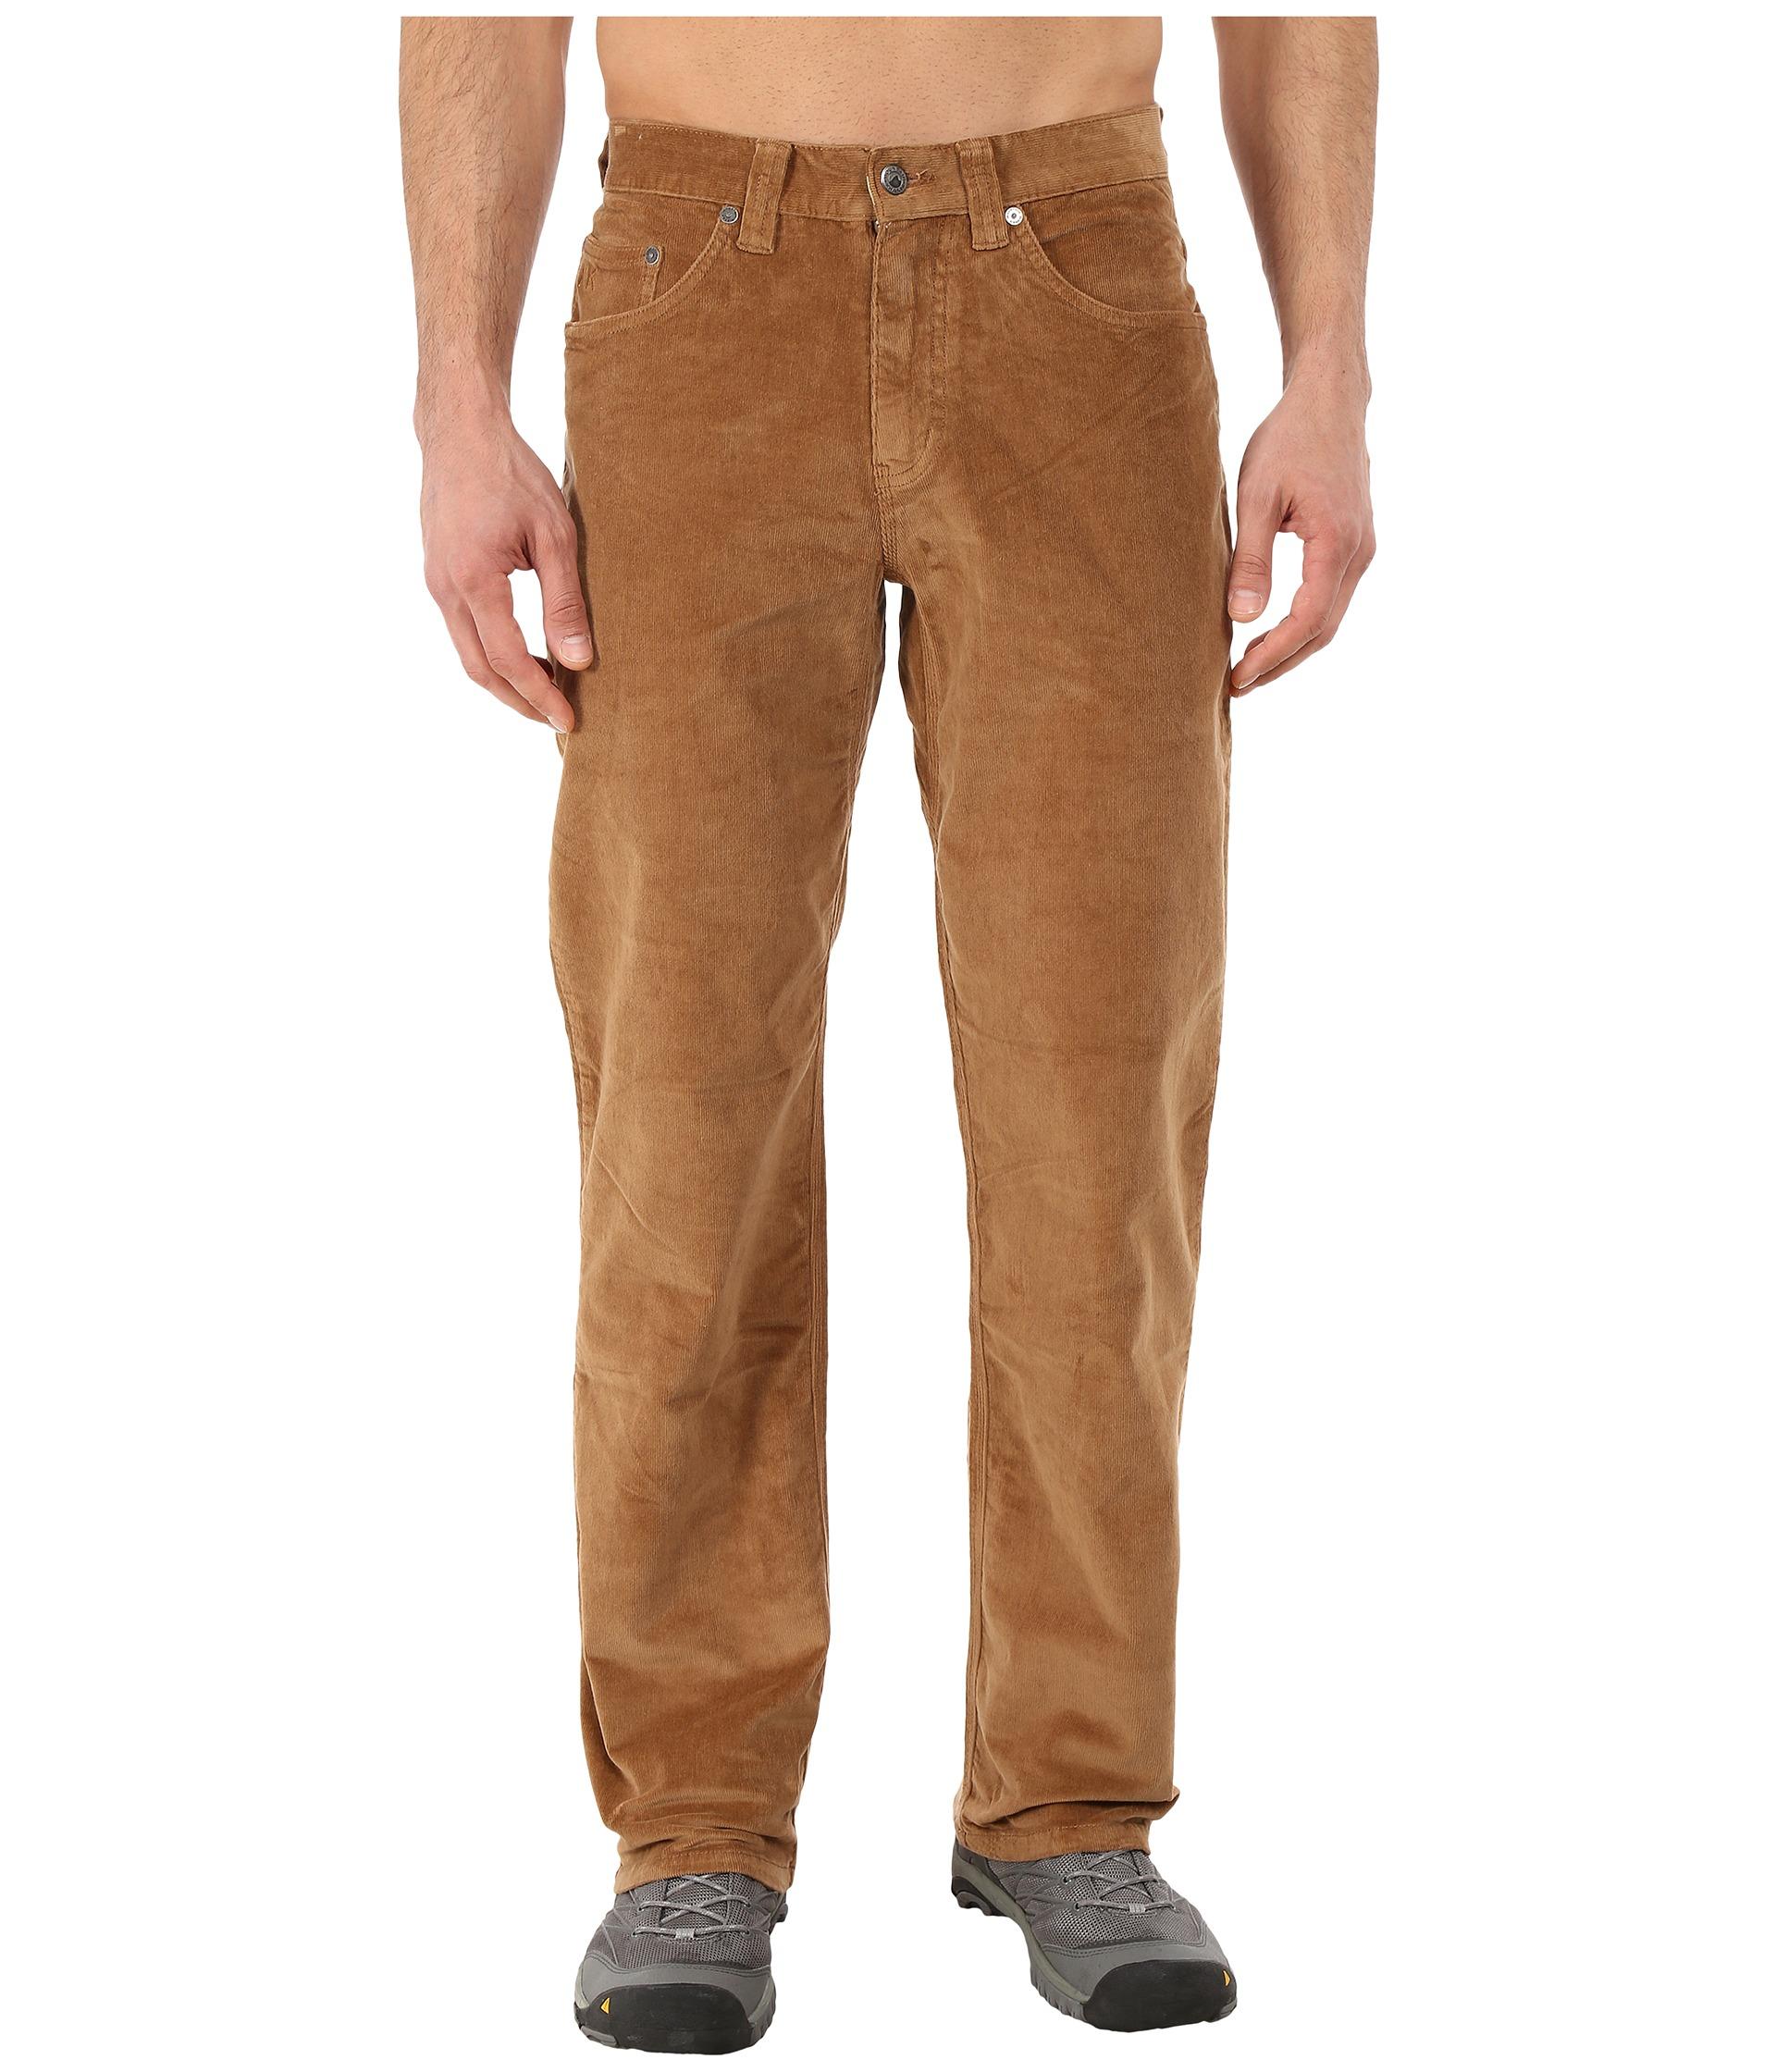 Awesome Cropped Capri Belted Brown Brown Khaki Khaki Womens Womens Pants